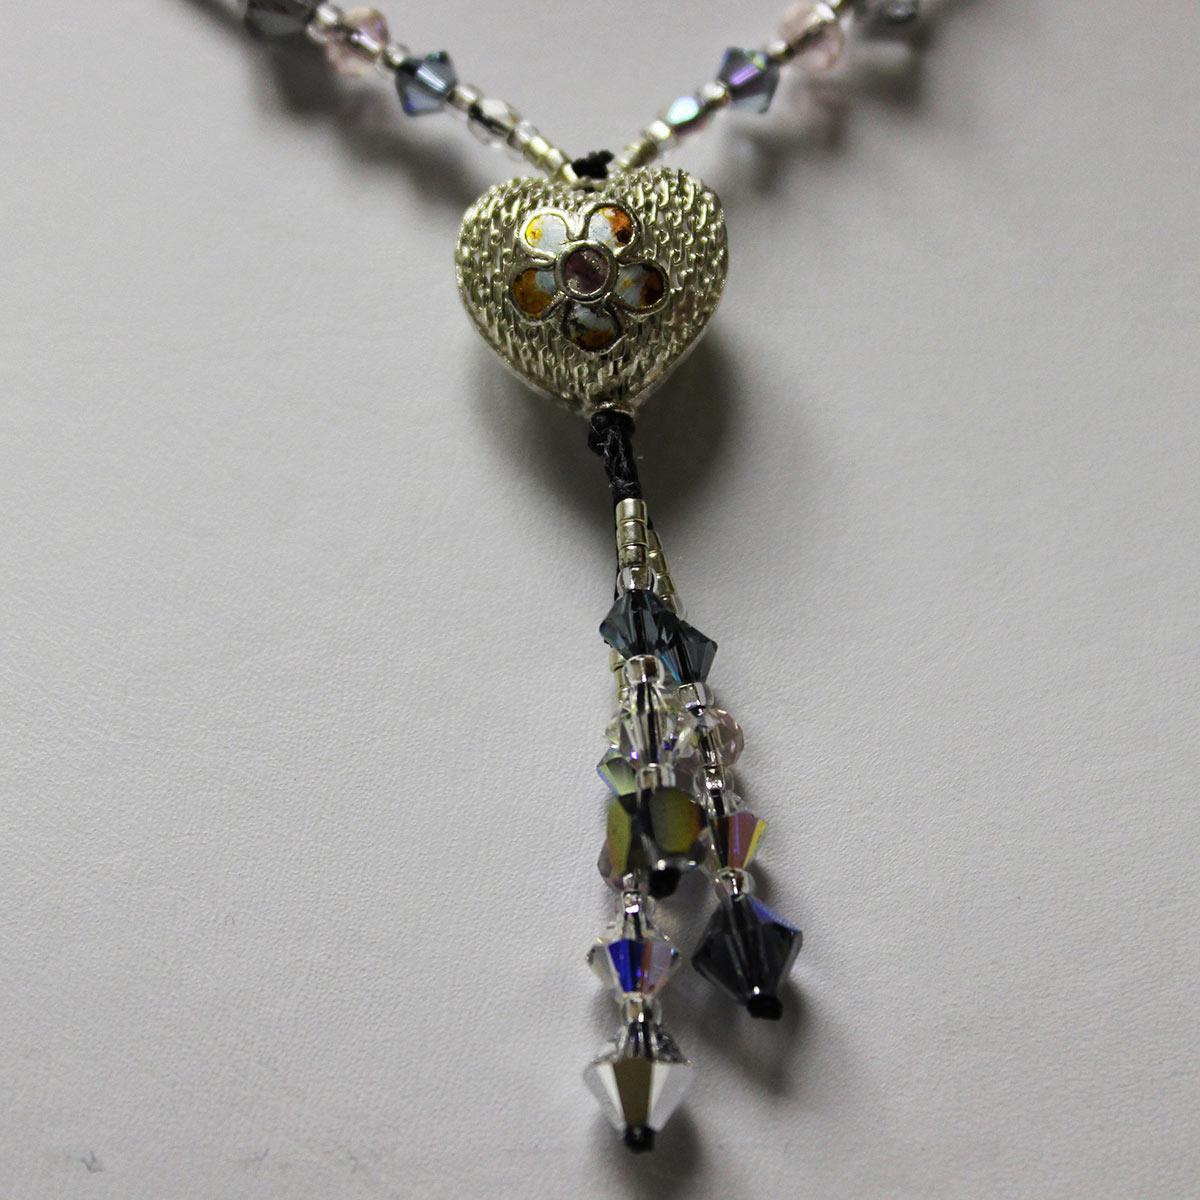 crystal necklace, drop necklace, Cloisonné bead, Cloisonné necklace, heart shaped center bead, handmade silver necklace